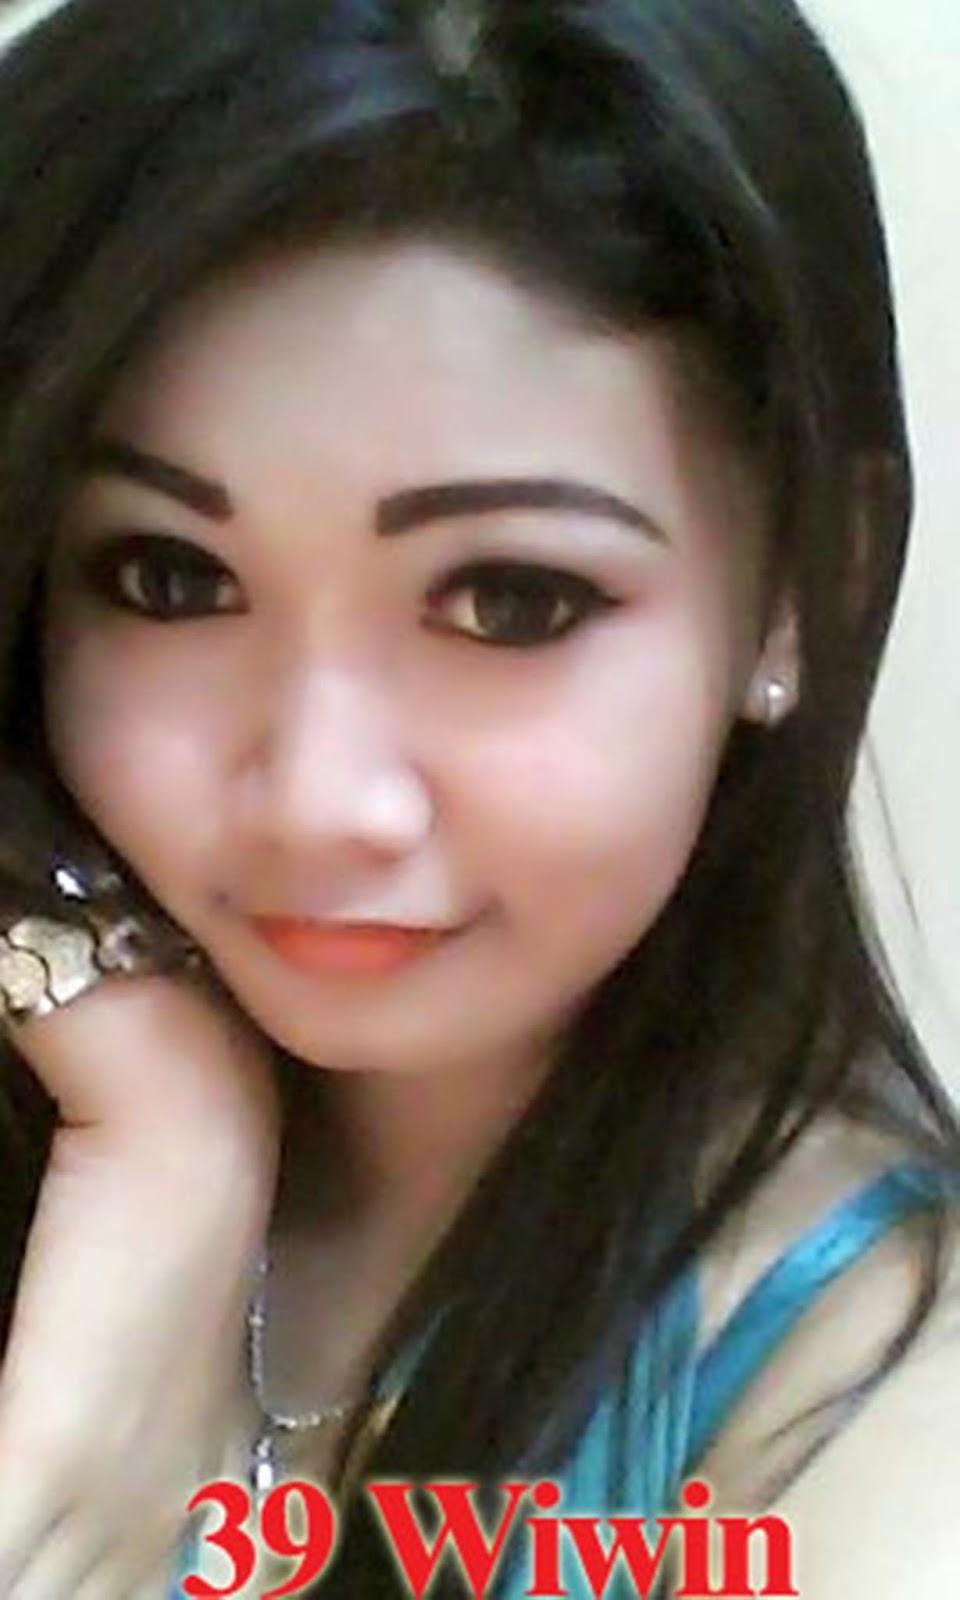 Situs bokep indonesia